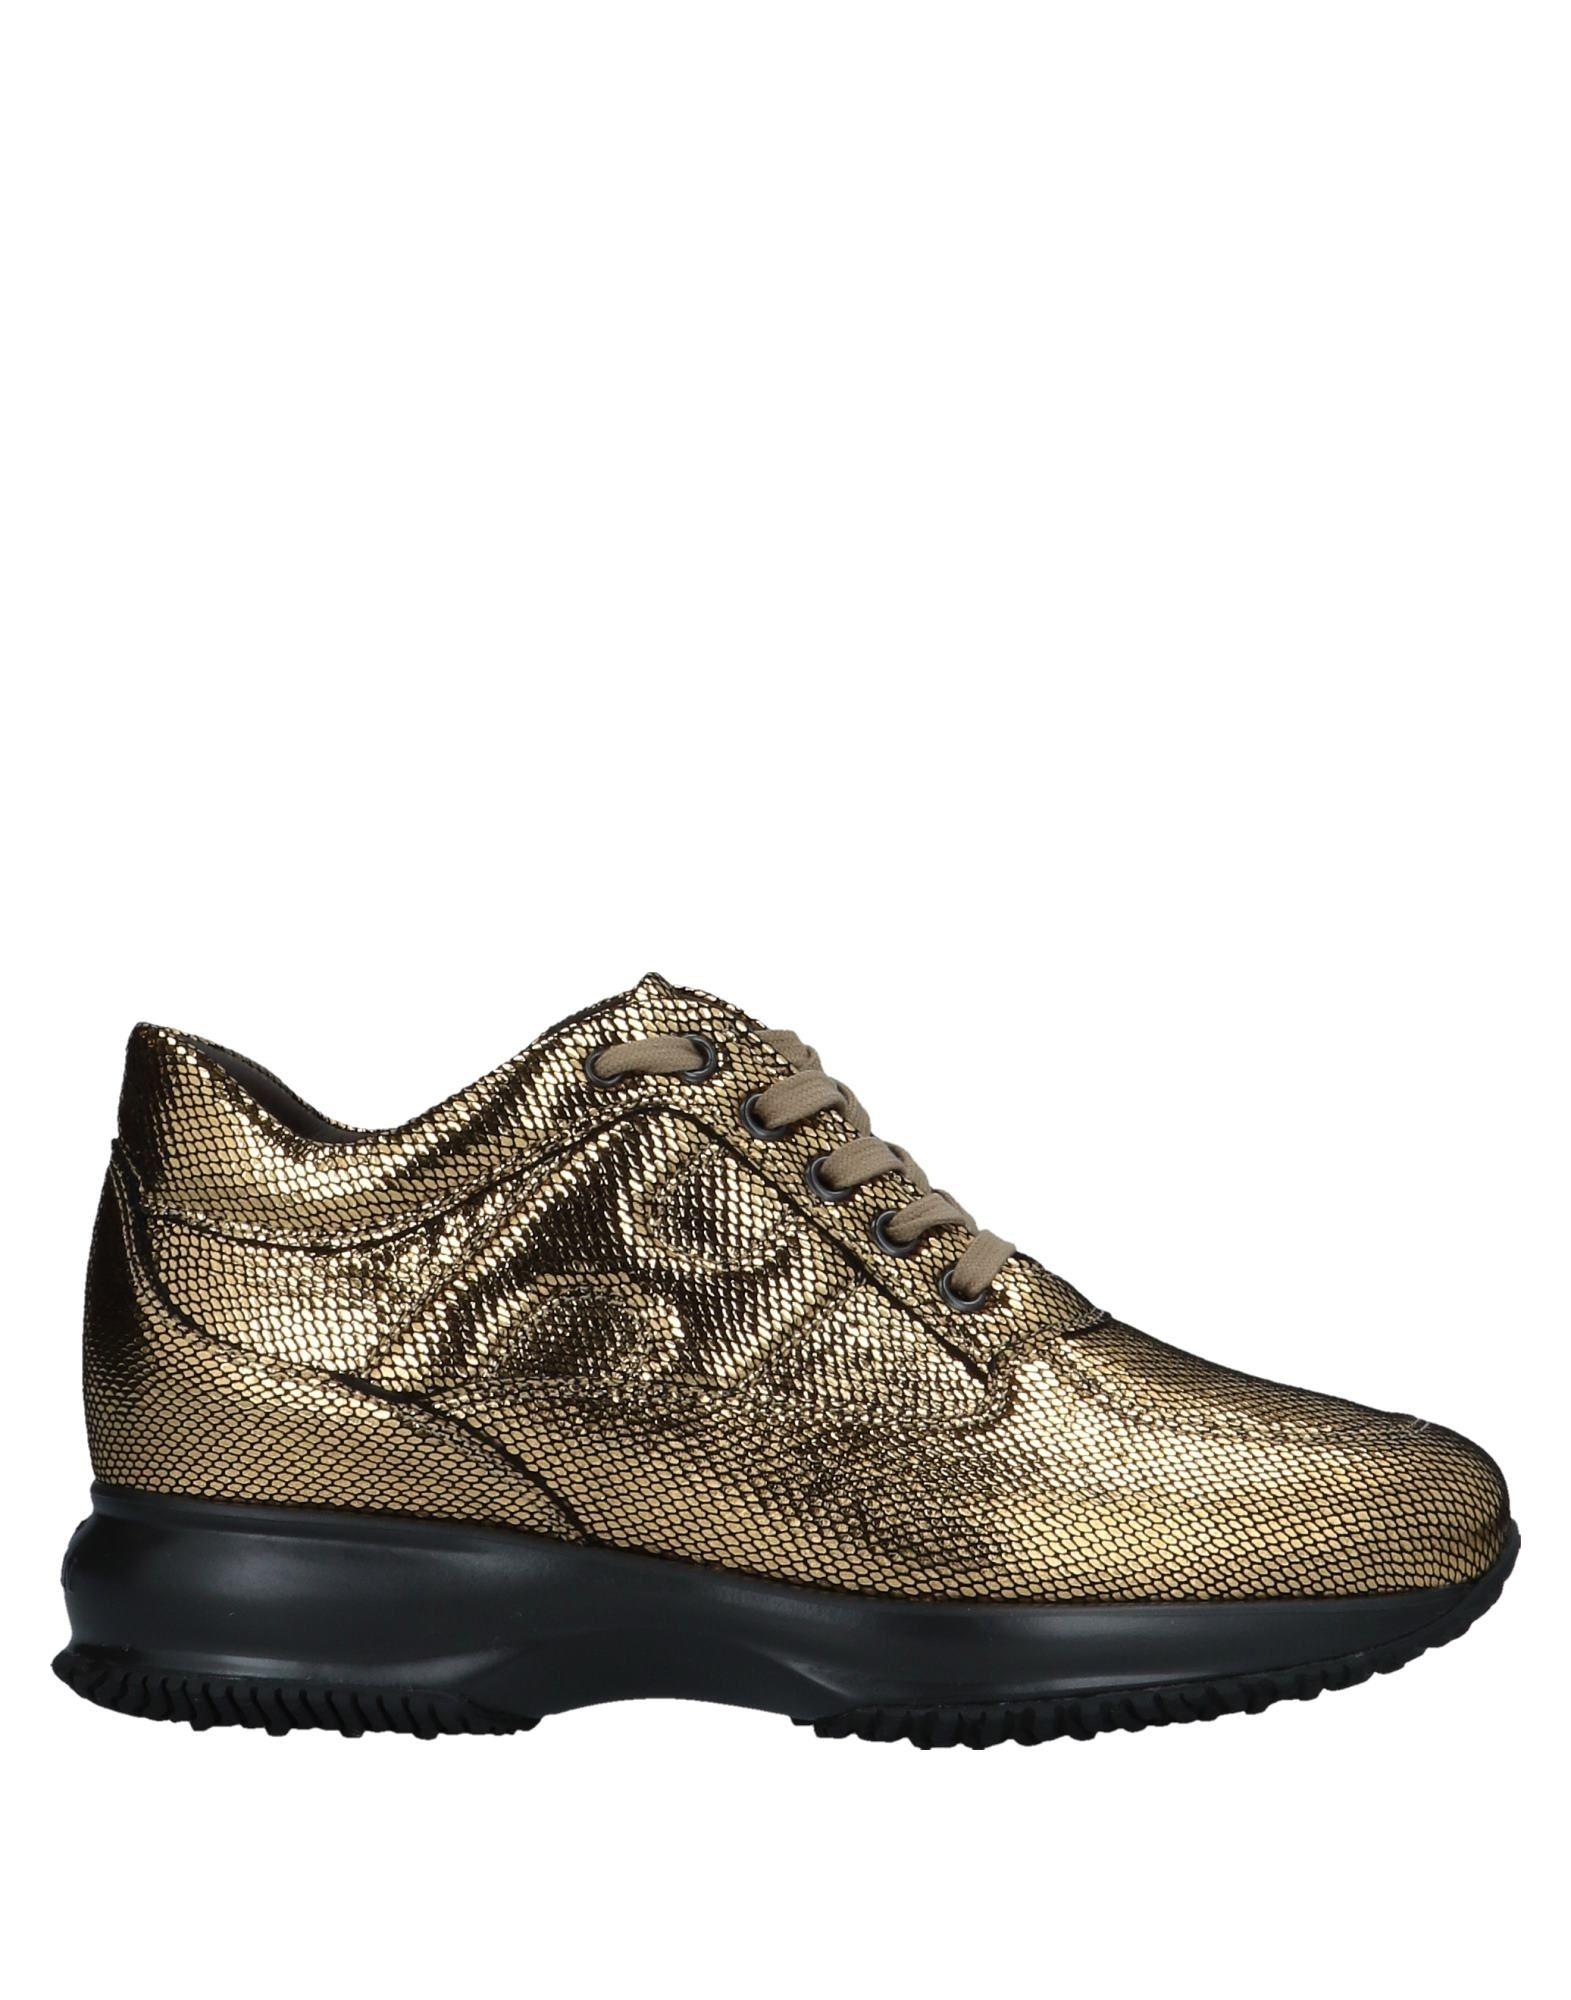 Moda Sneakers Hogan Donna - 11539592QX